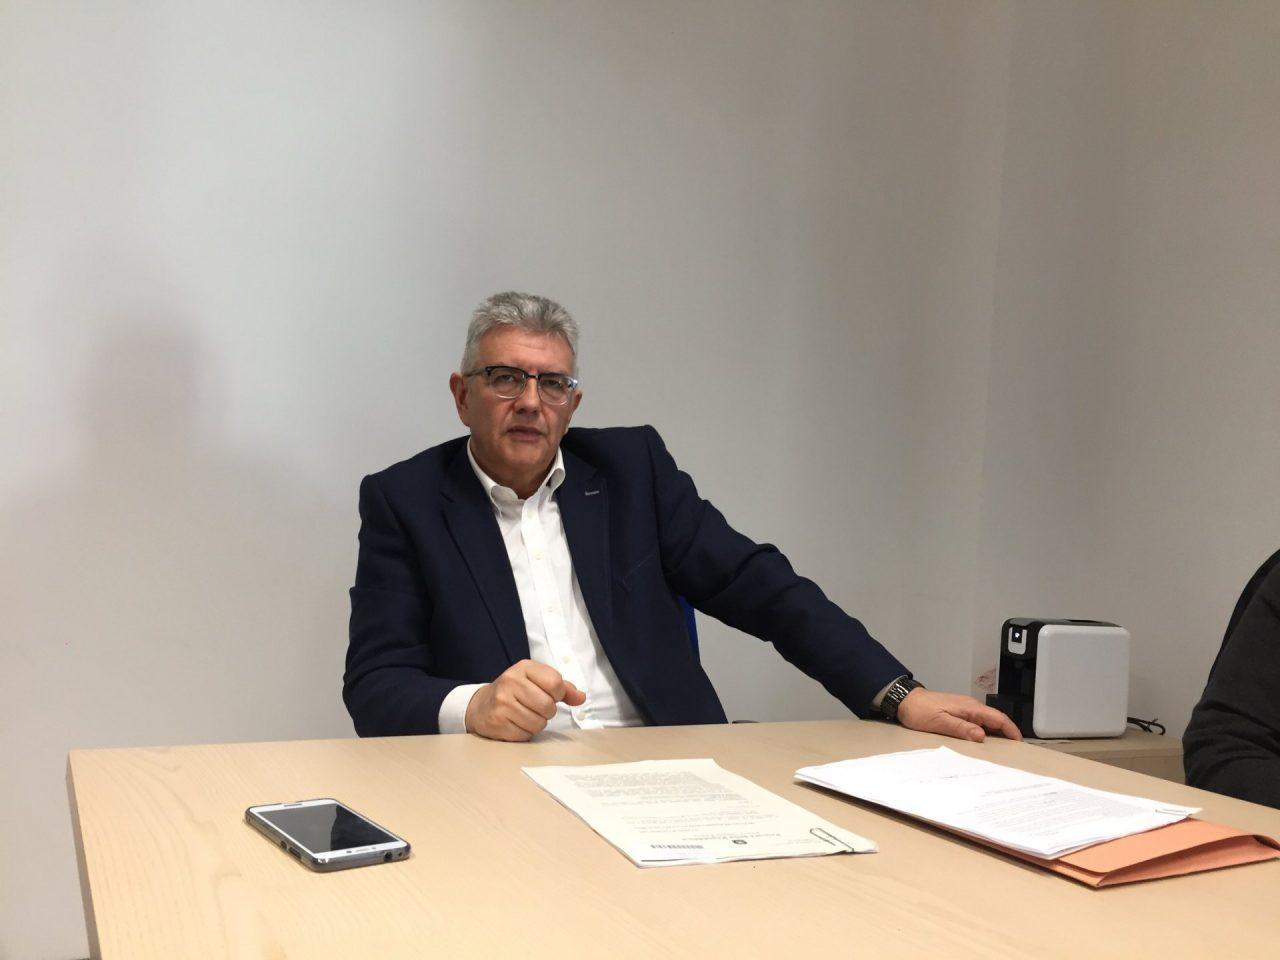 Il sindaco Dario Veneroni durante la conferenza stampa